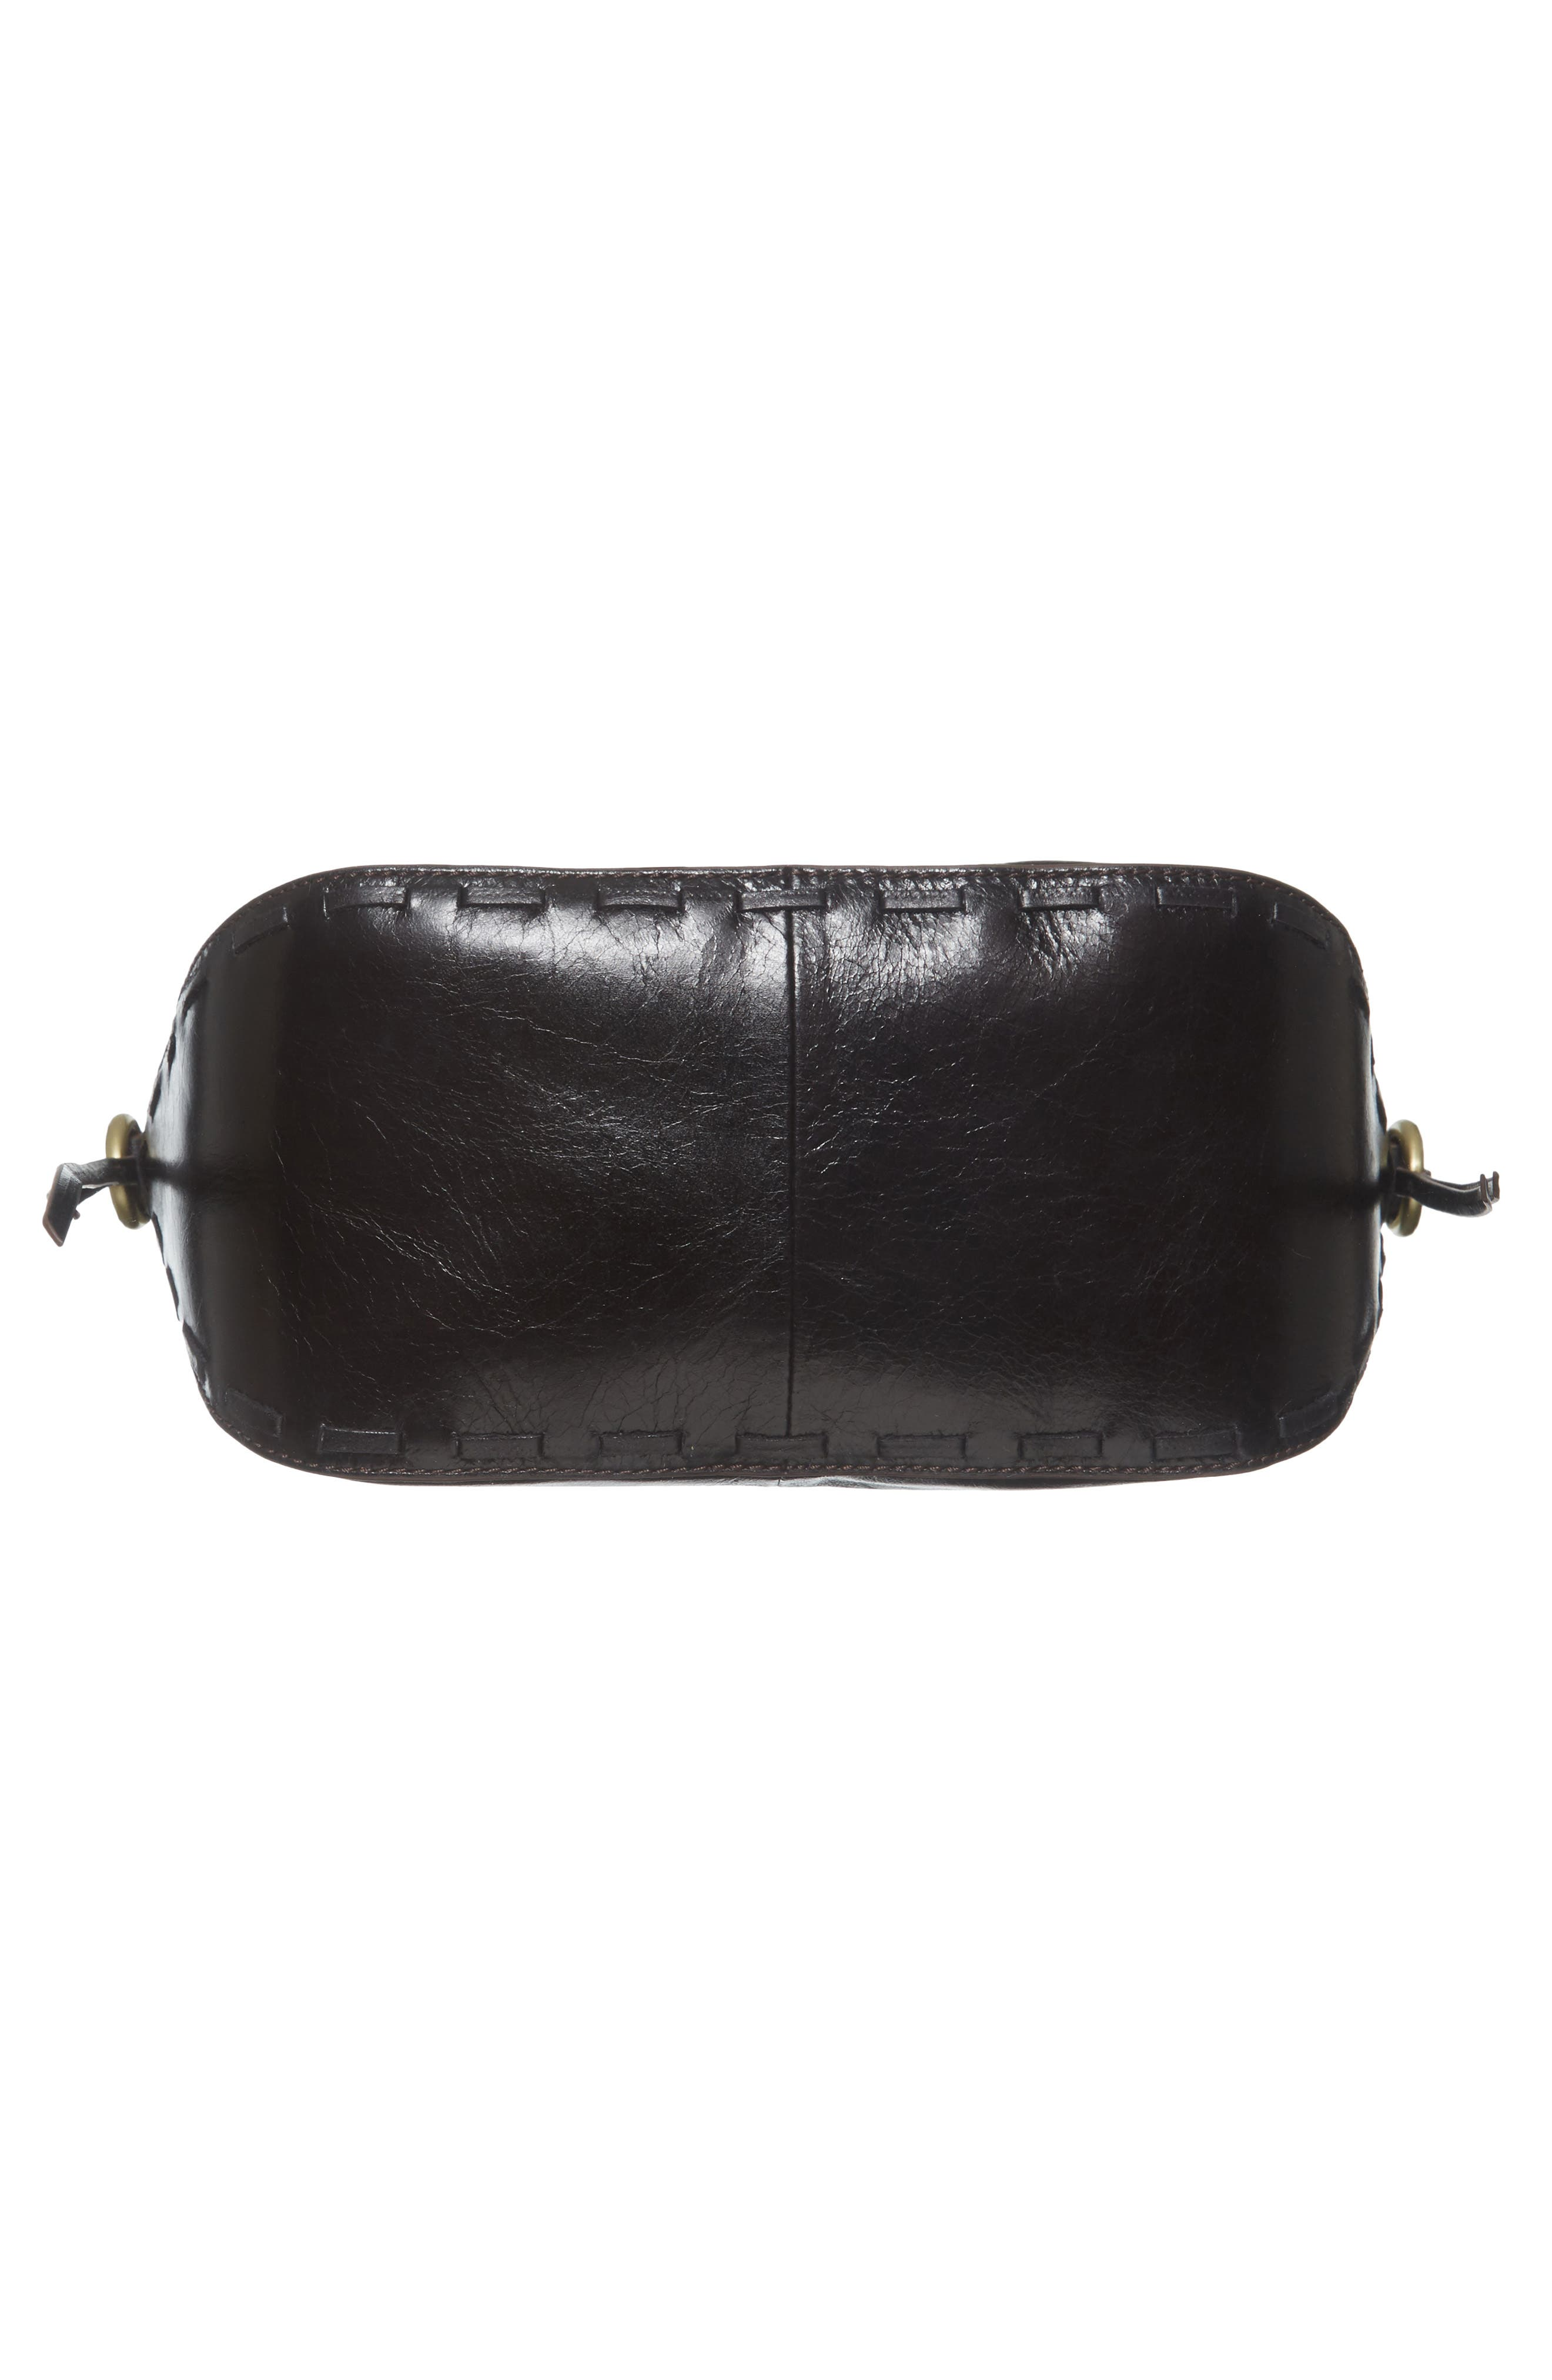 Muse Calfskin Leather Crossbody Bag,                             Alternate thumbnail 6, color,                             001